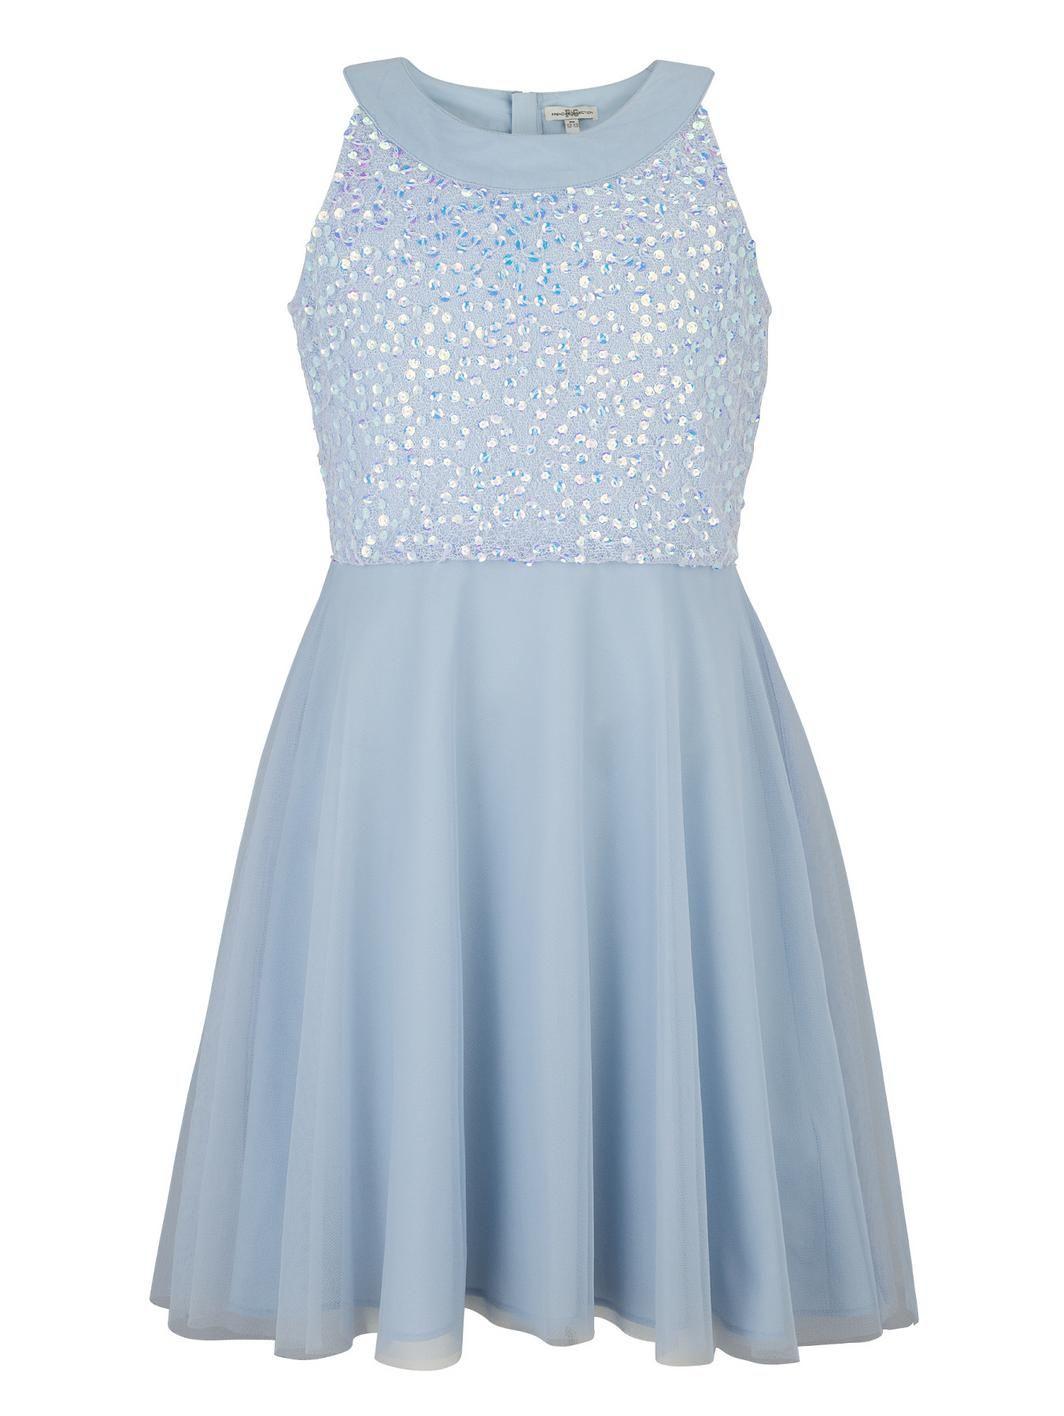 Littlewoods dresses for weddings  French Connection Dip Hem Skater Dress  littlewoods  Emmaus